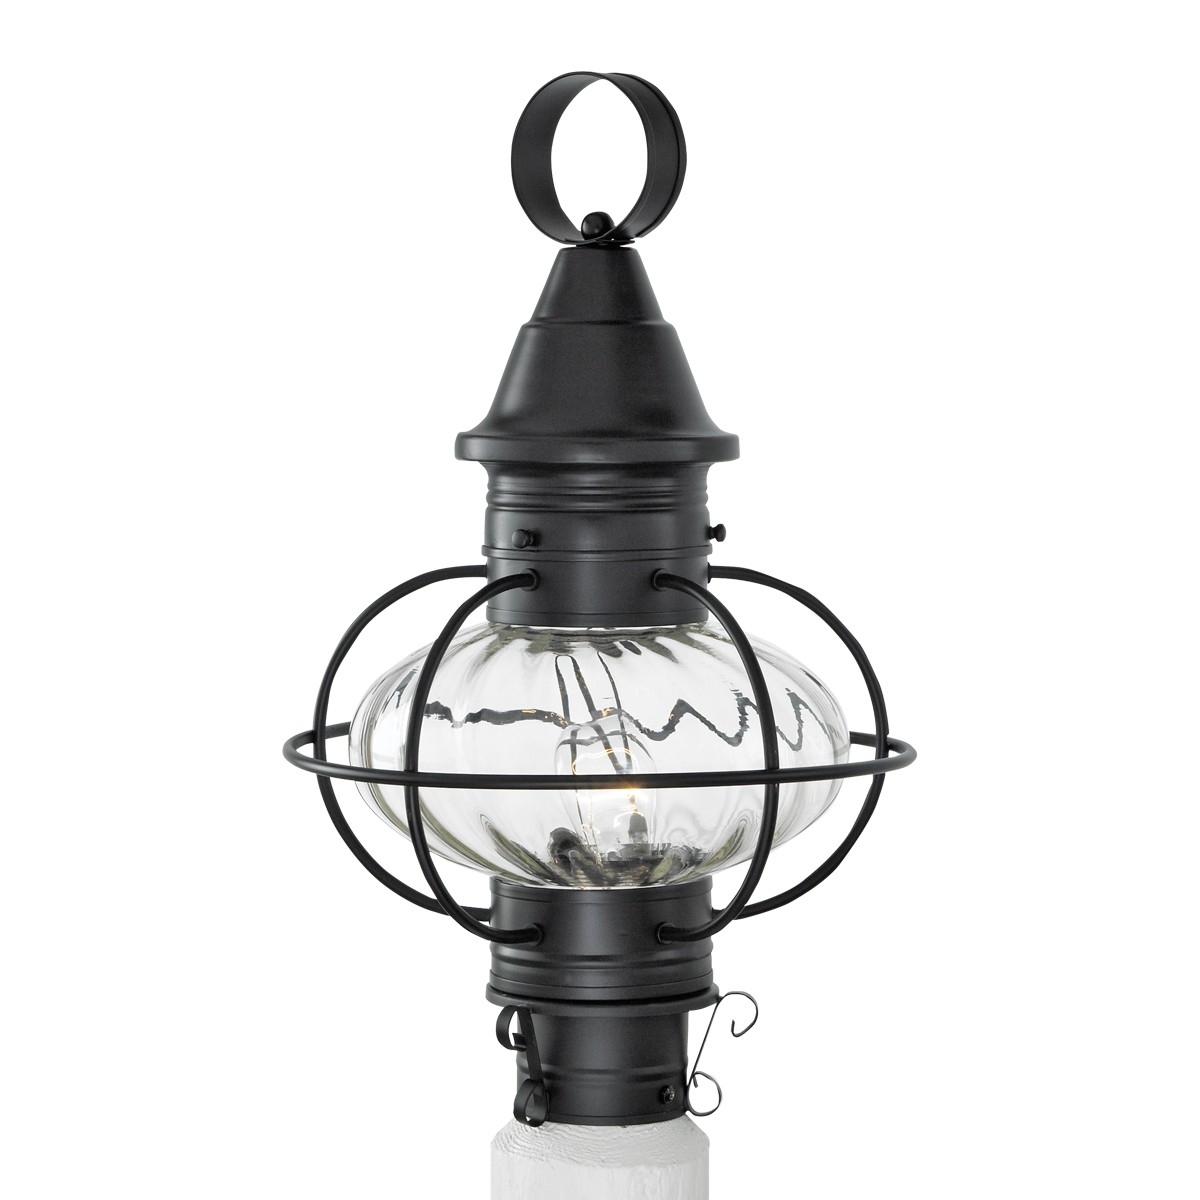 Vidalia Outdoor Glass Onion Post Light Pertaining To Favorite Outdoor Lighting Onion Lanterns (Gallery 9 of 20)